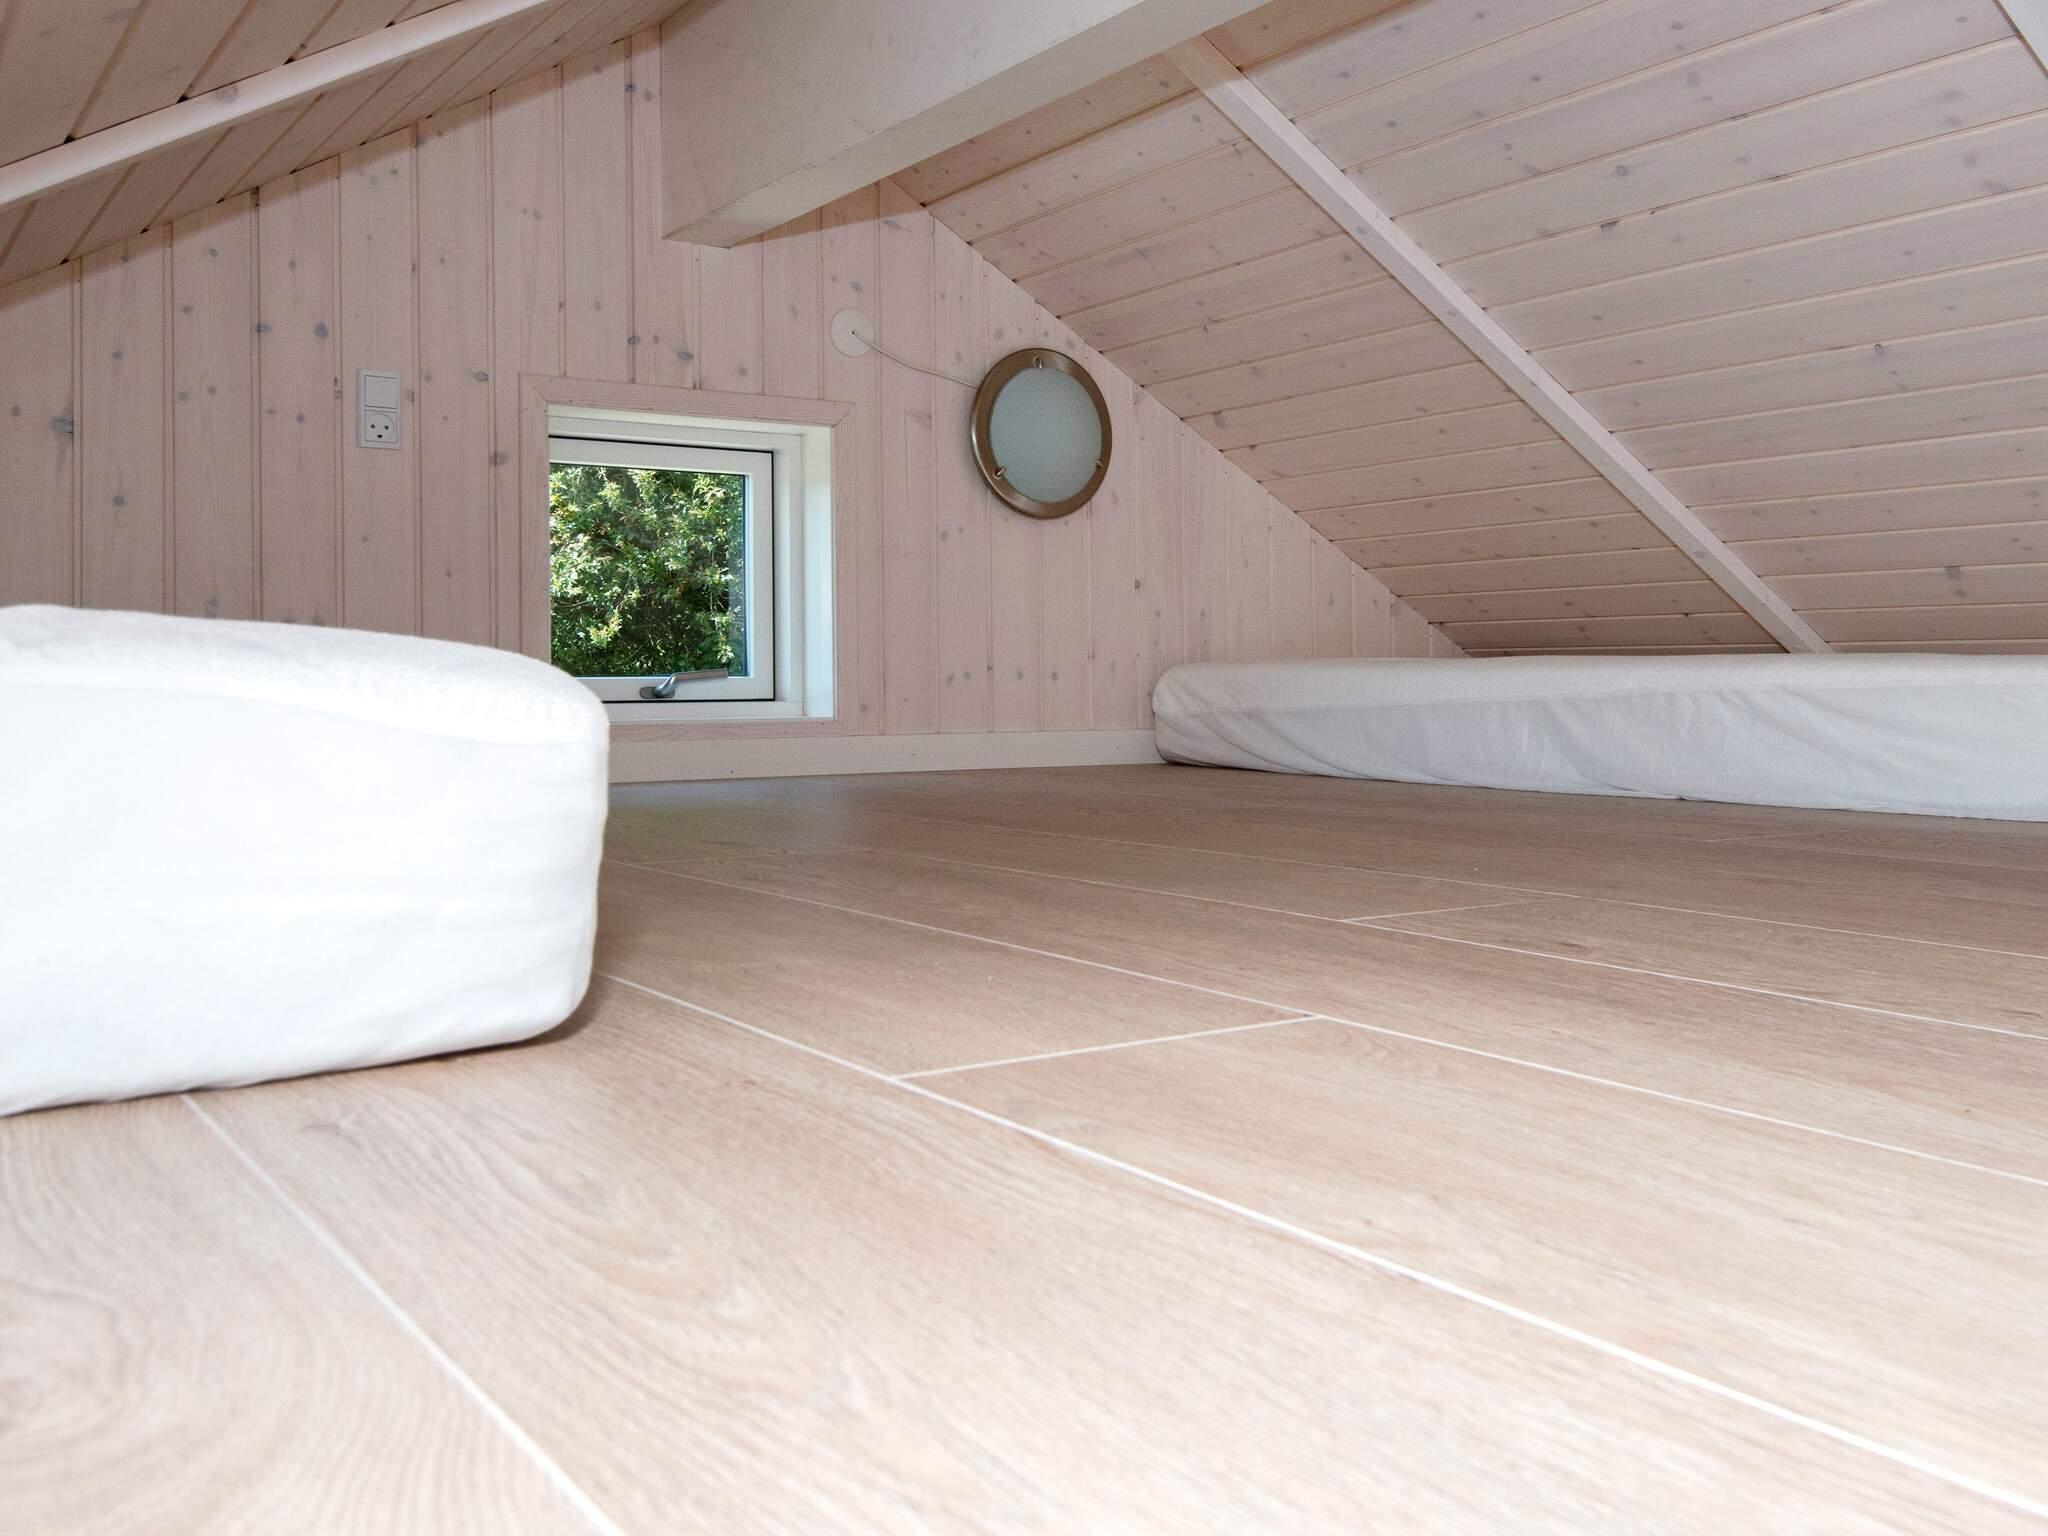 Maison de vacances Helgenæs (2597444), Knebel, , Mer Baltique danoise, Danemark, image 17